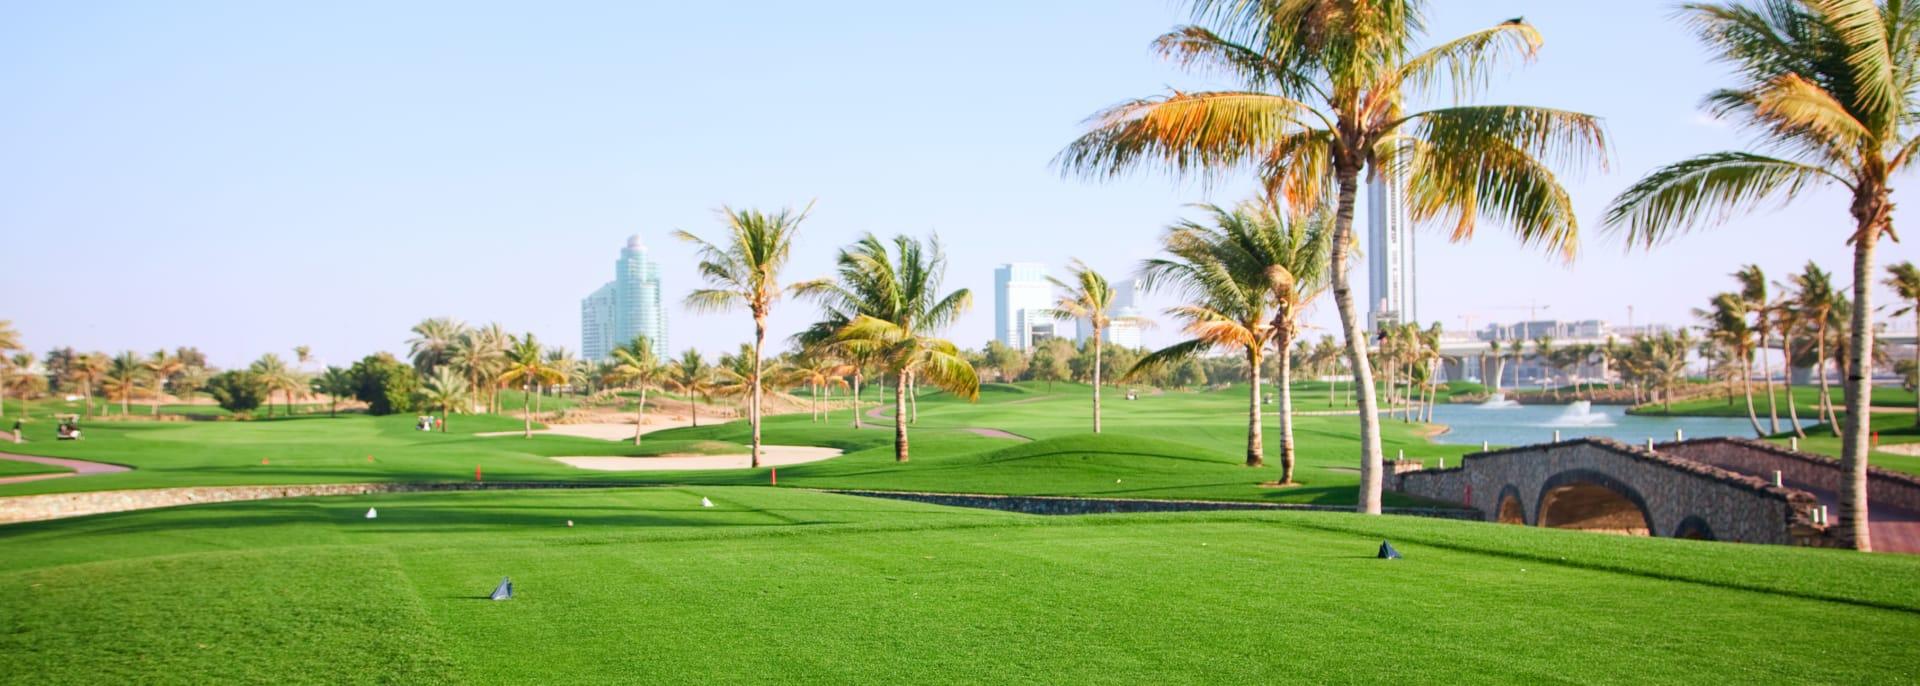 Golfplatz, Dubai